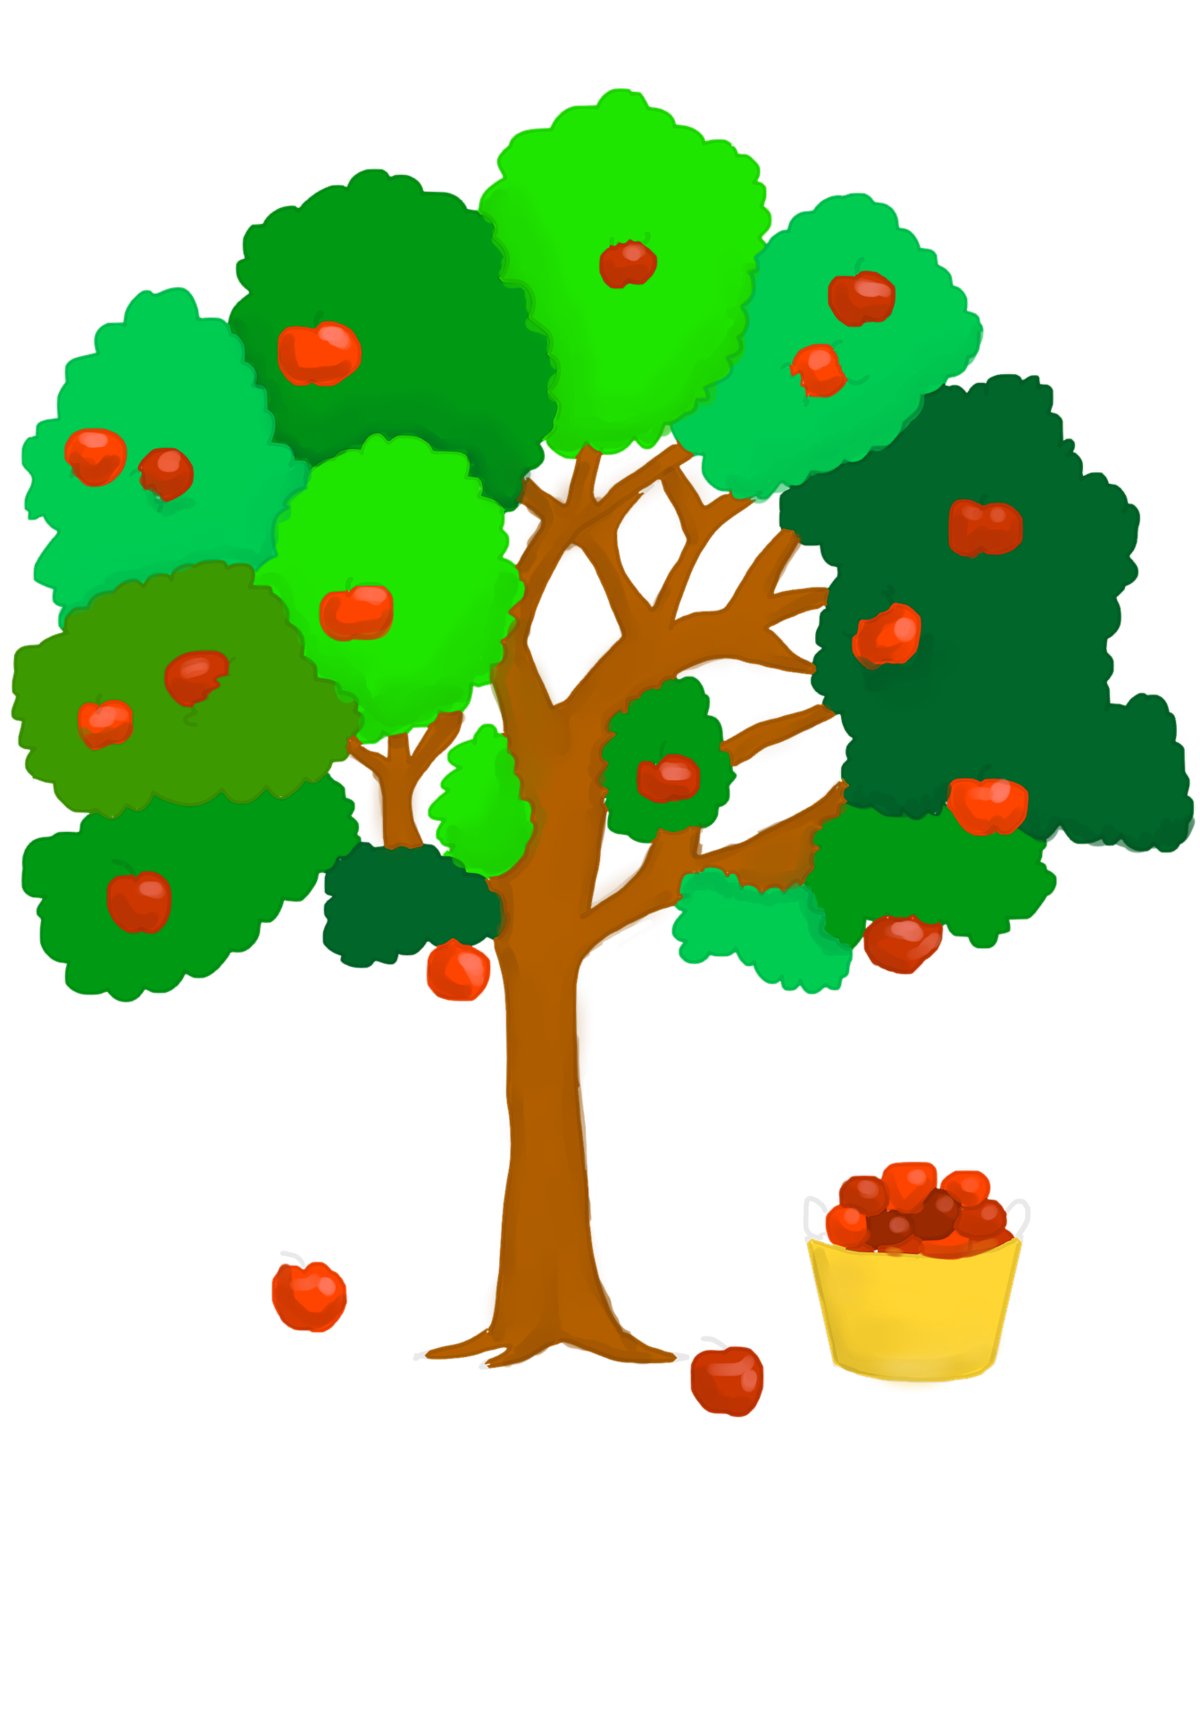 цепь цепочка картинки дерево с яблочками если лицо актриса